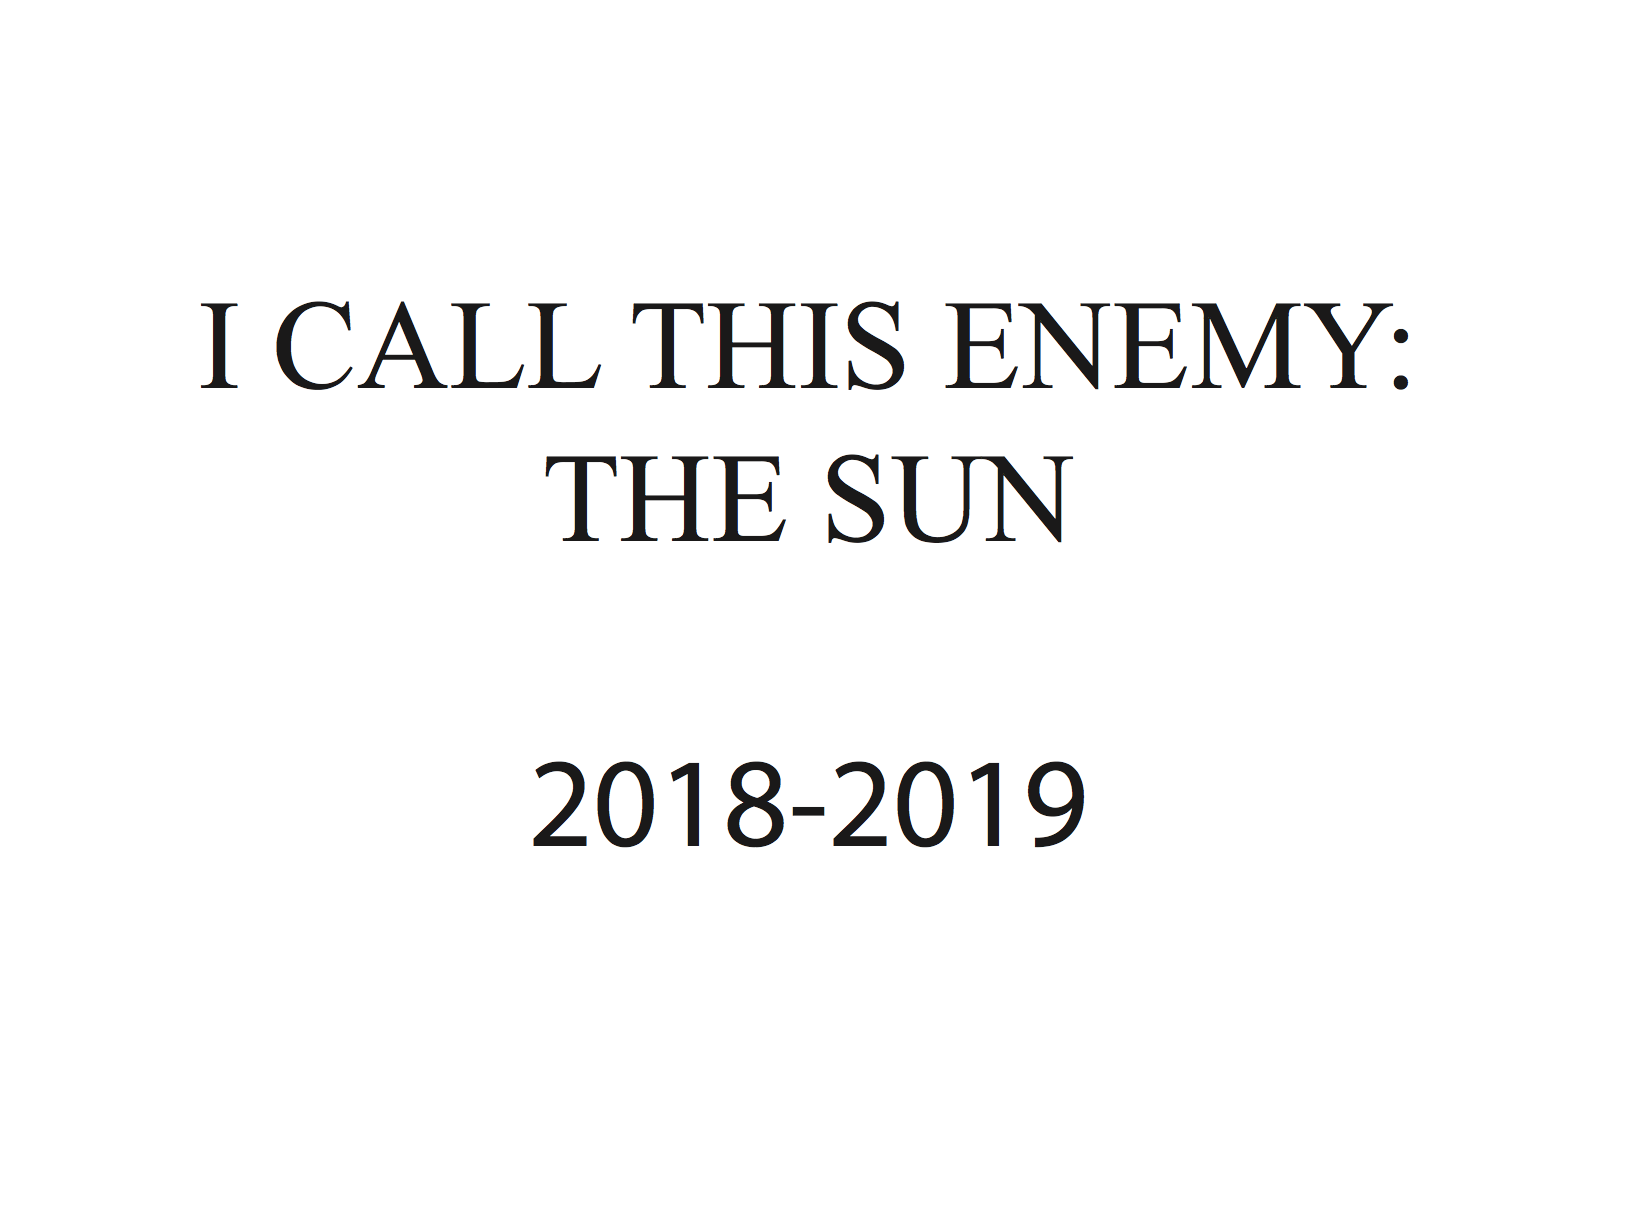 I Call This Enemy The Sun: 2018-2019 Calendar-